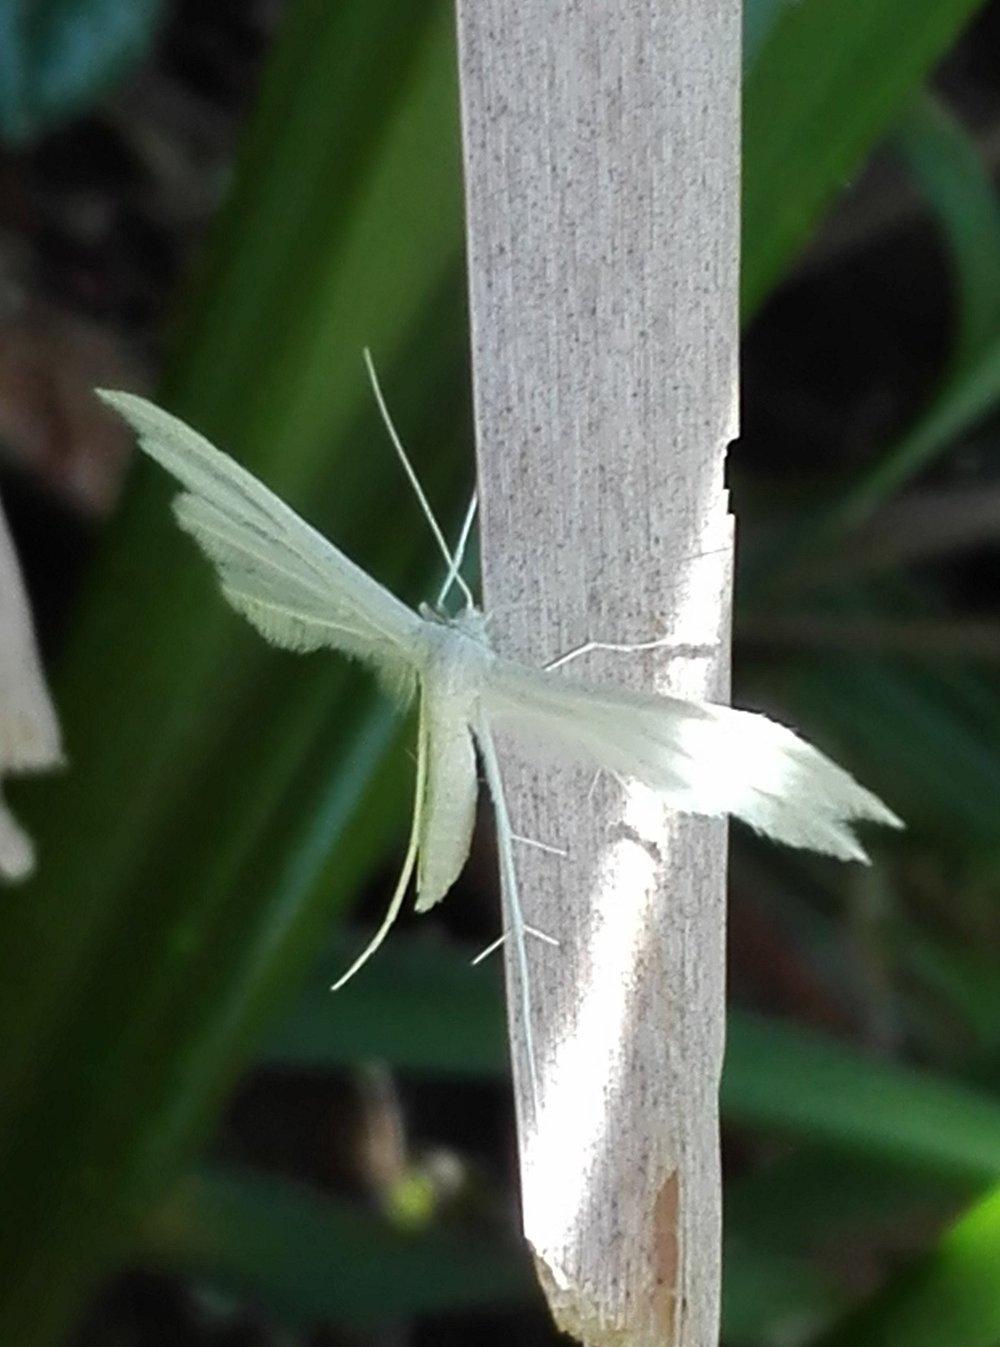 #212 White Plume Moth